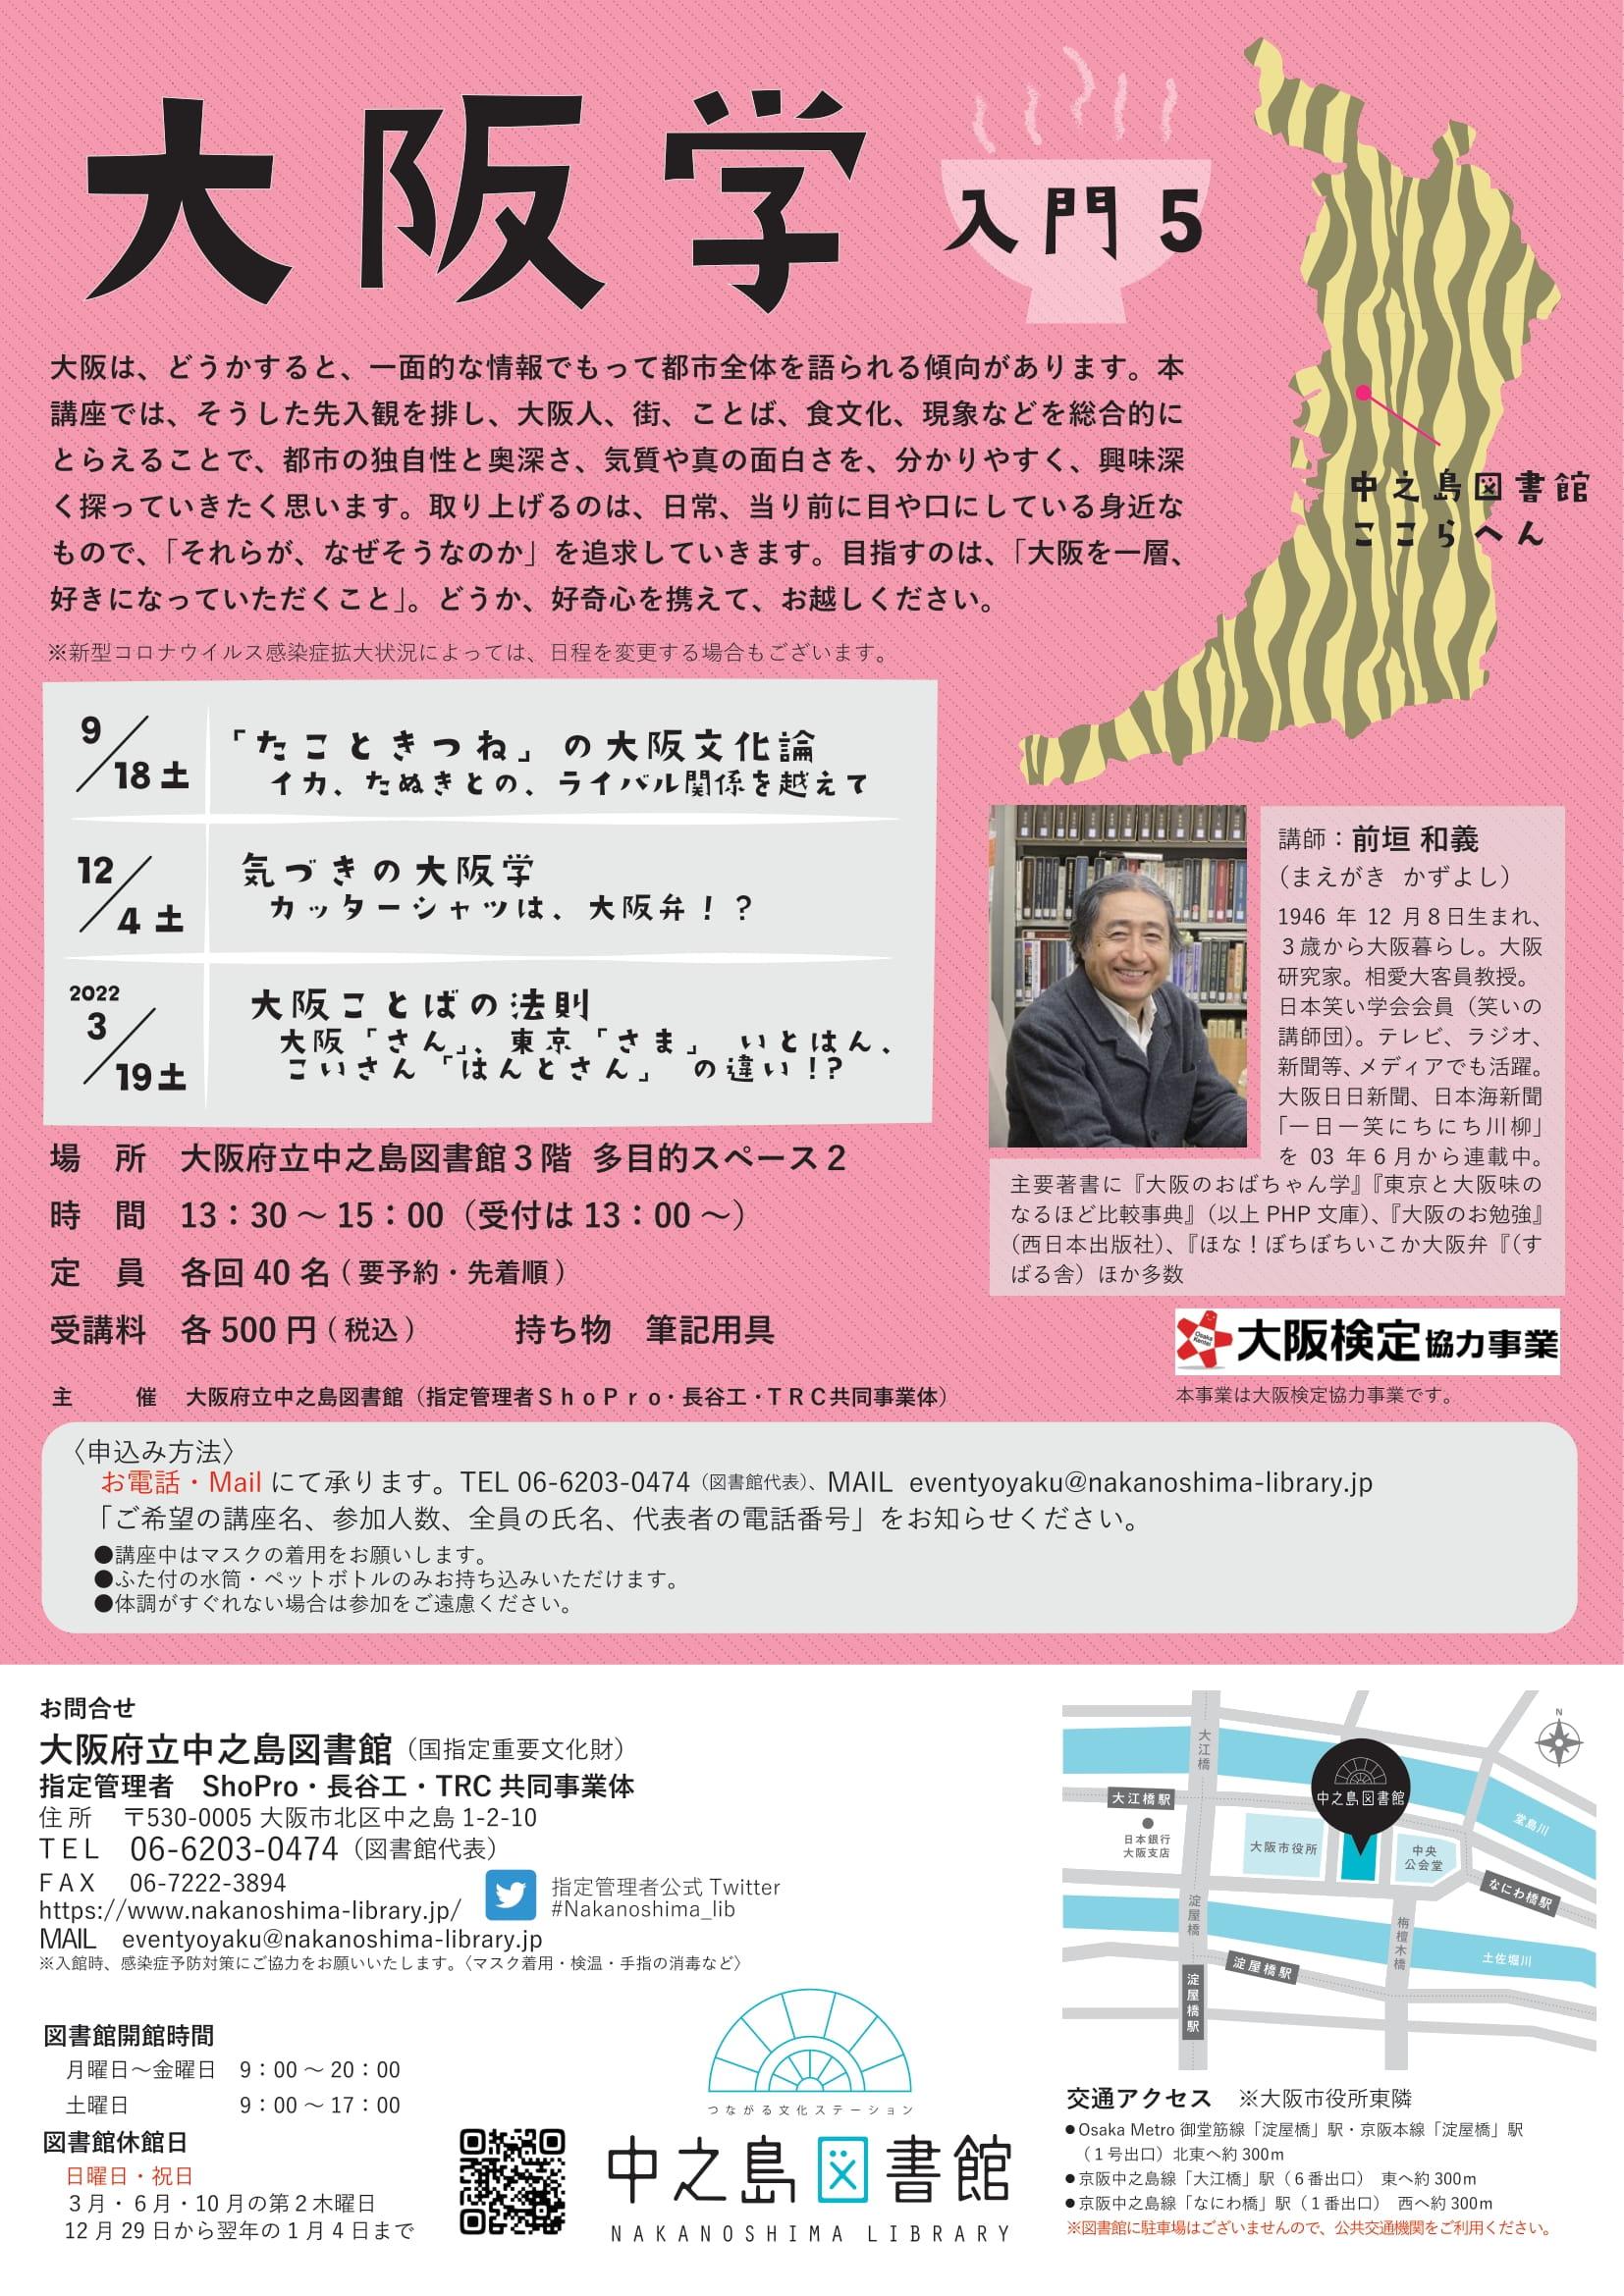 9月18日(土)・12月4日(土)・3月19日(土)大阪学入門5